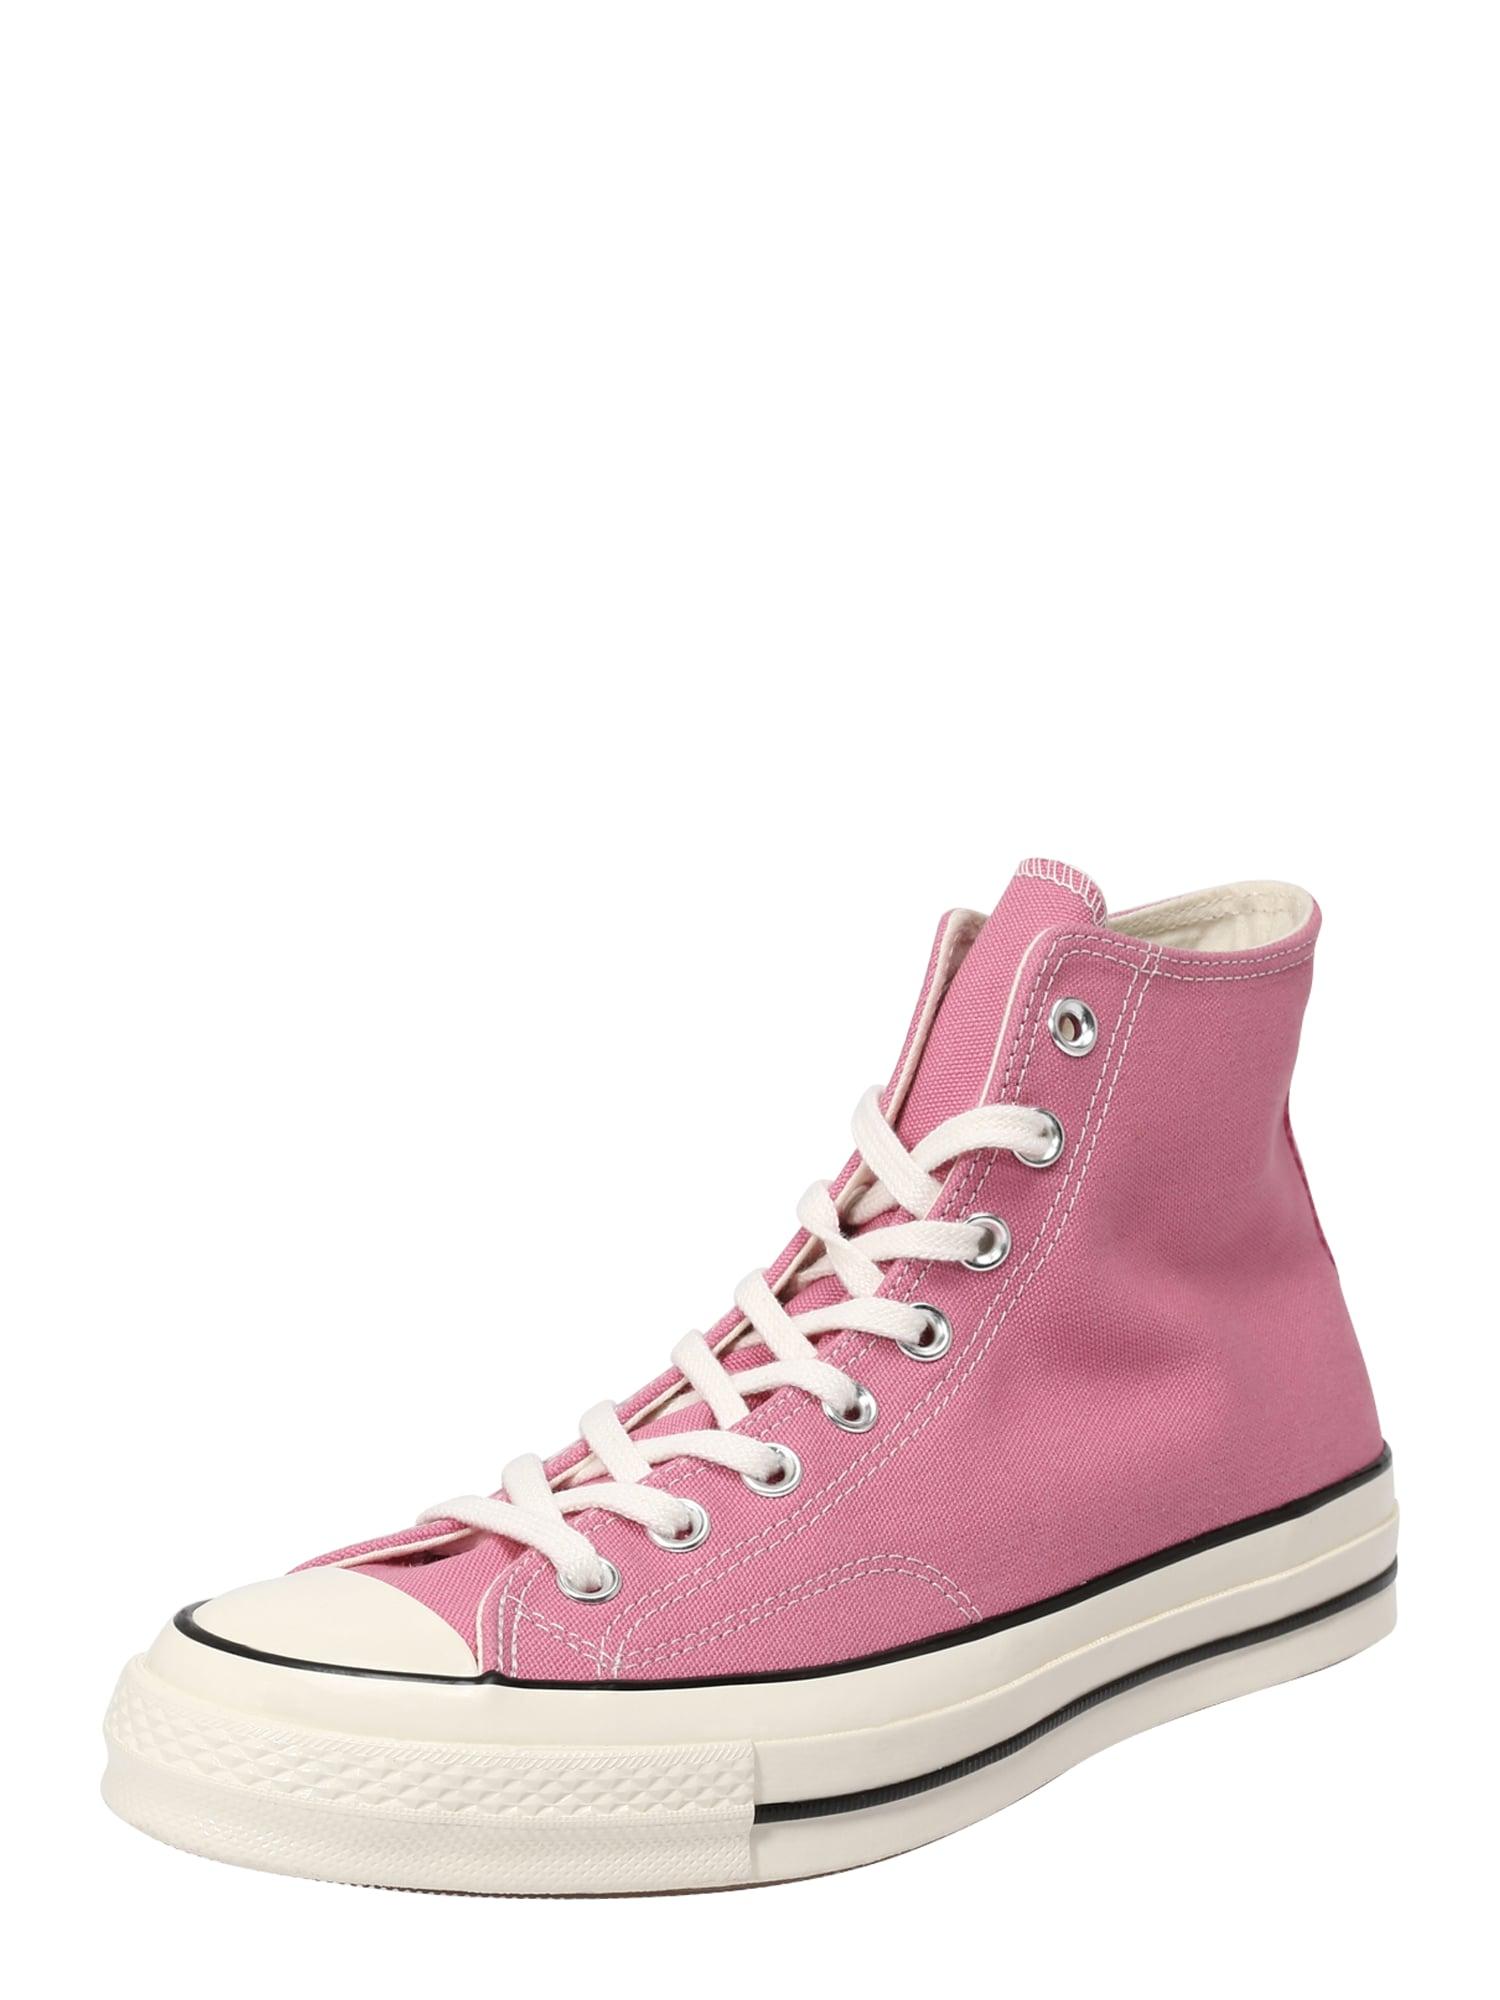 Kotníkové tenisky CHUCK 70 ALWAYS ON - HI pink bílá CONVERSE